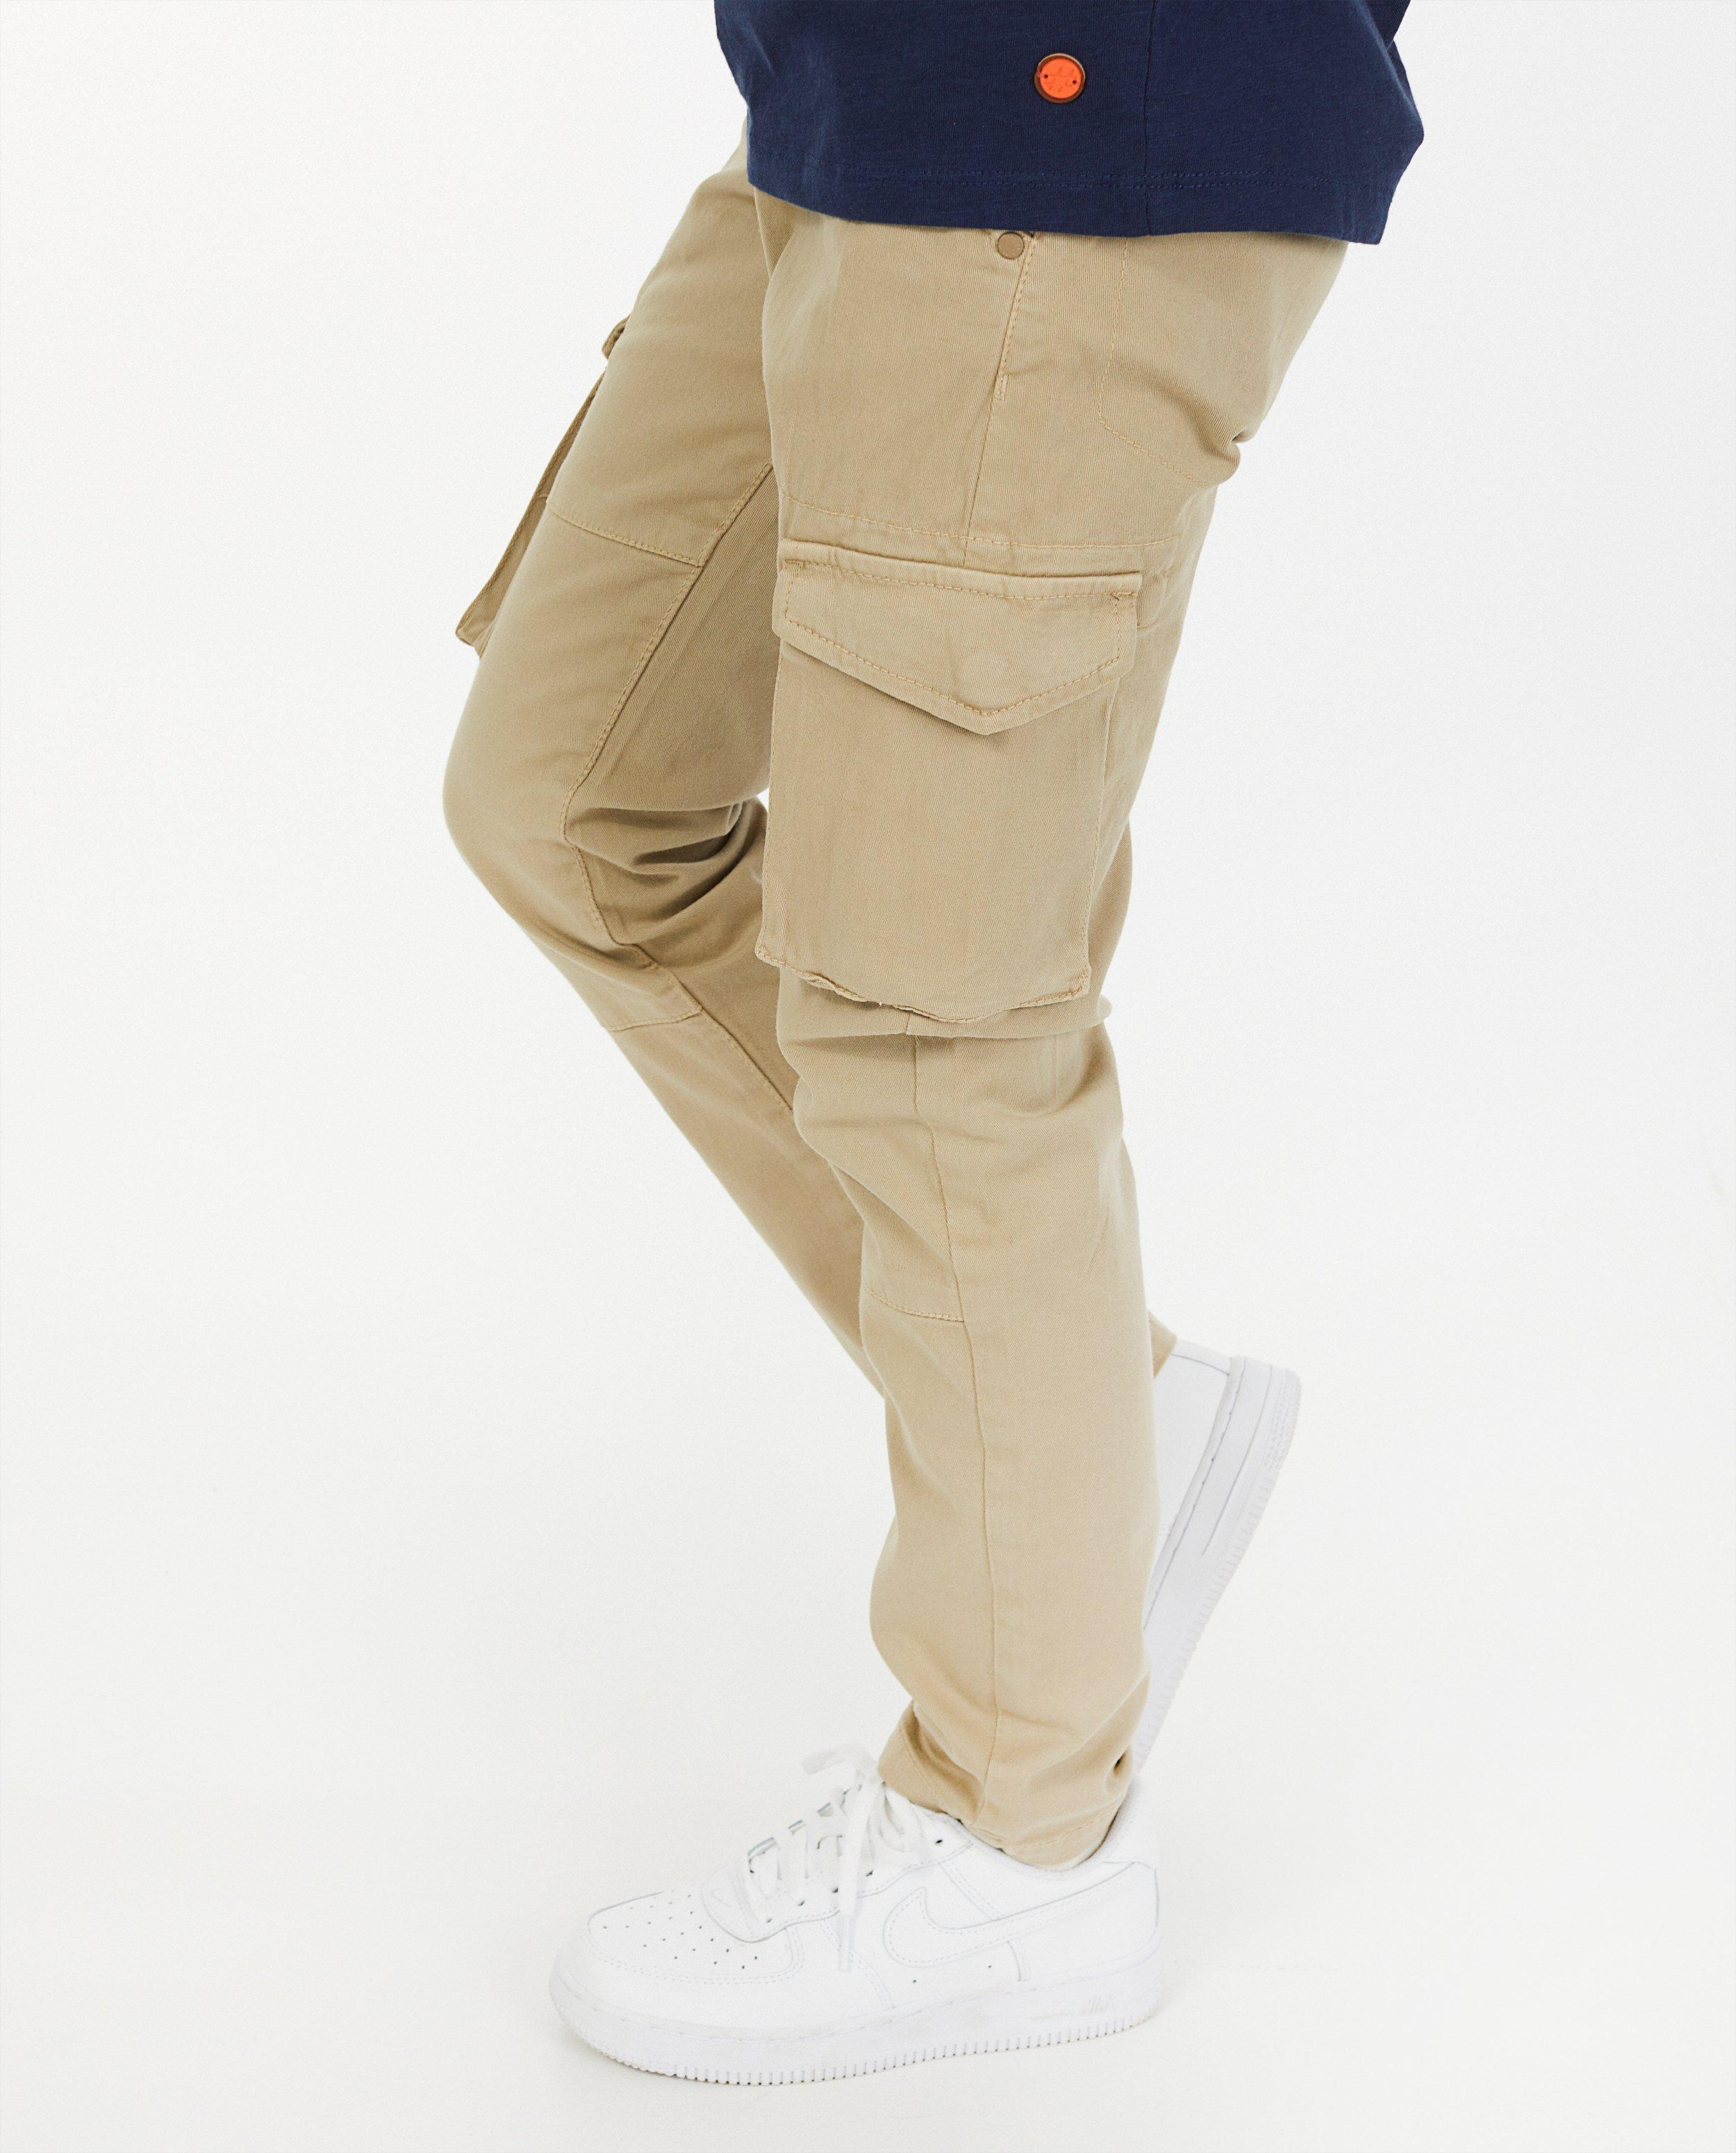 Pantalon cargo beige #LikeMe